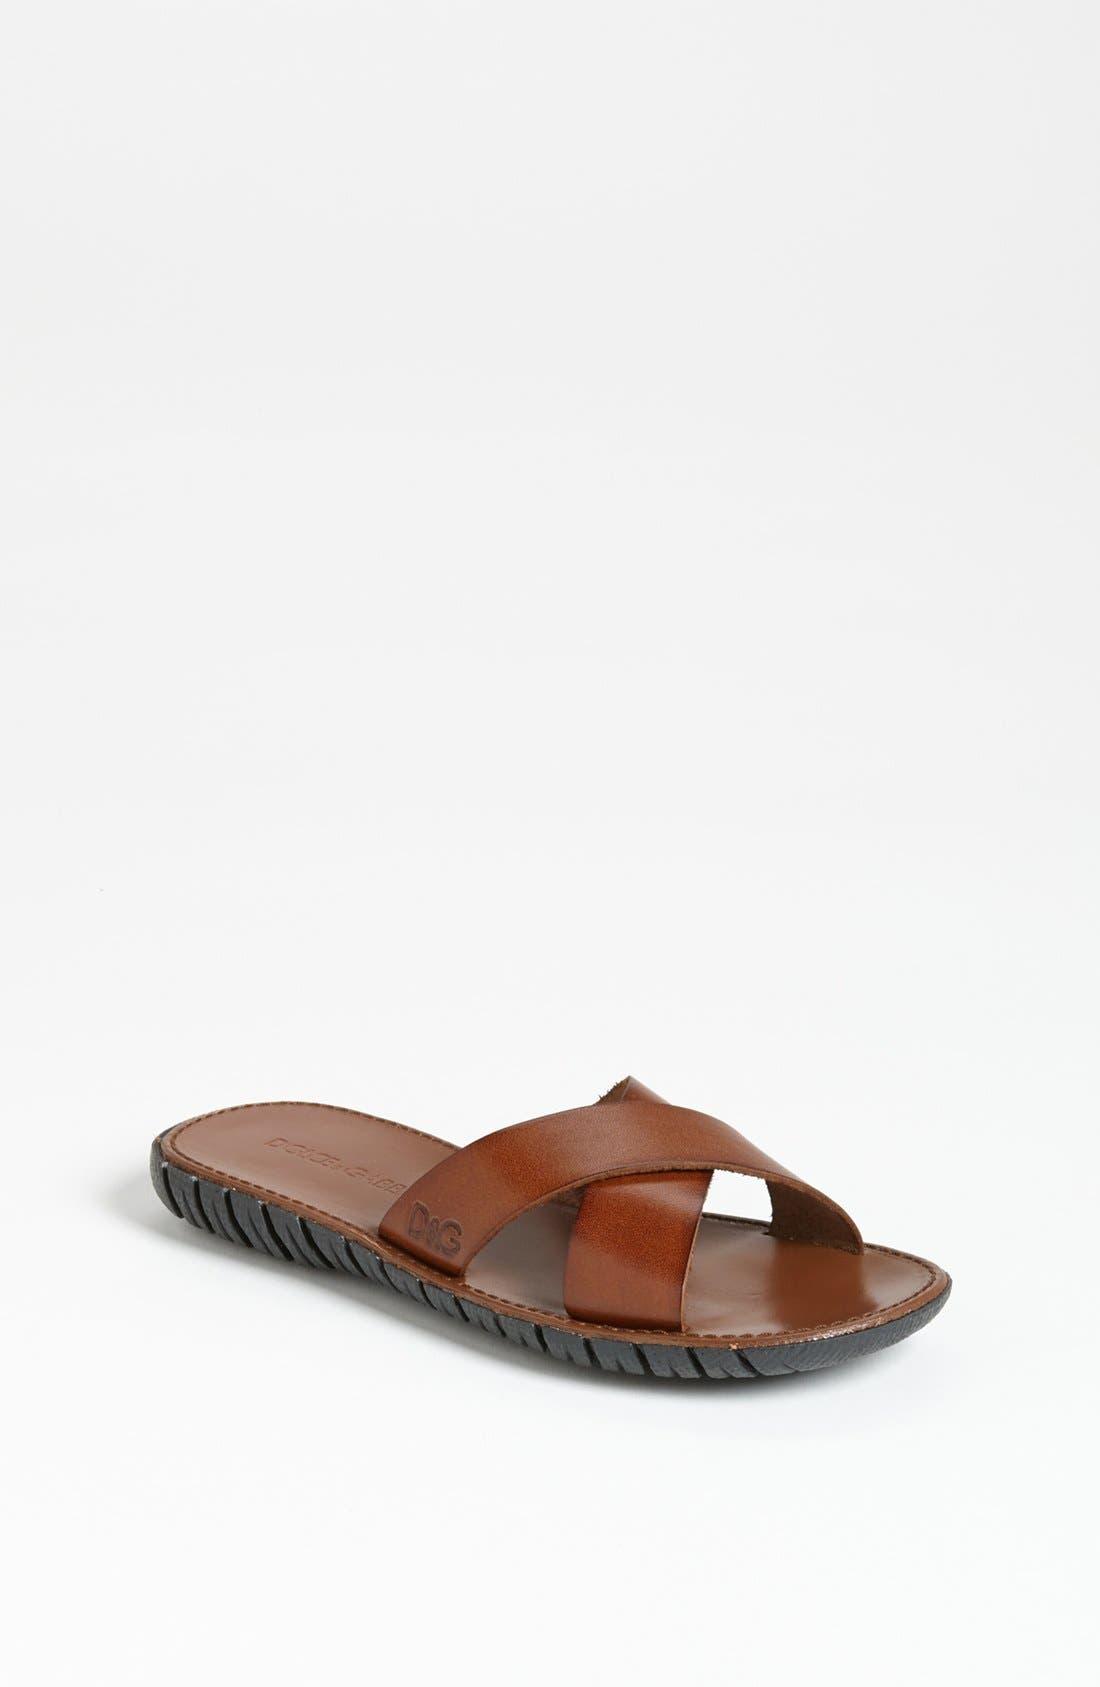 Alternate Image 1 Selected - Dolce&Gabbana Cross Strap Sandal (Little Kid & Big Kid)